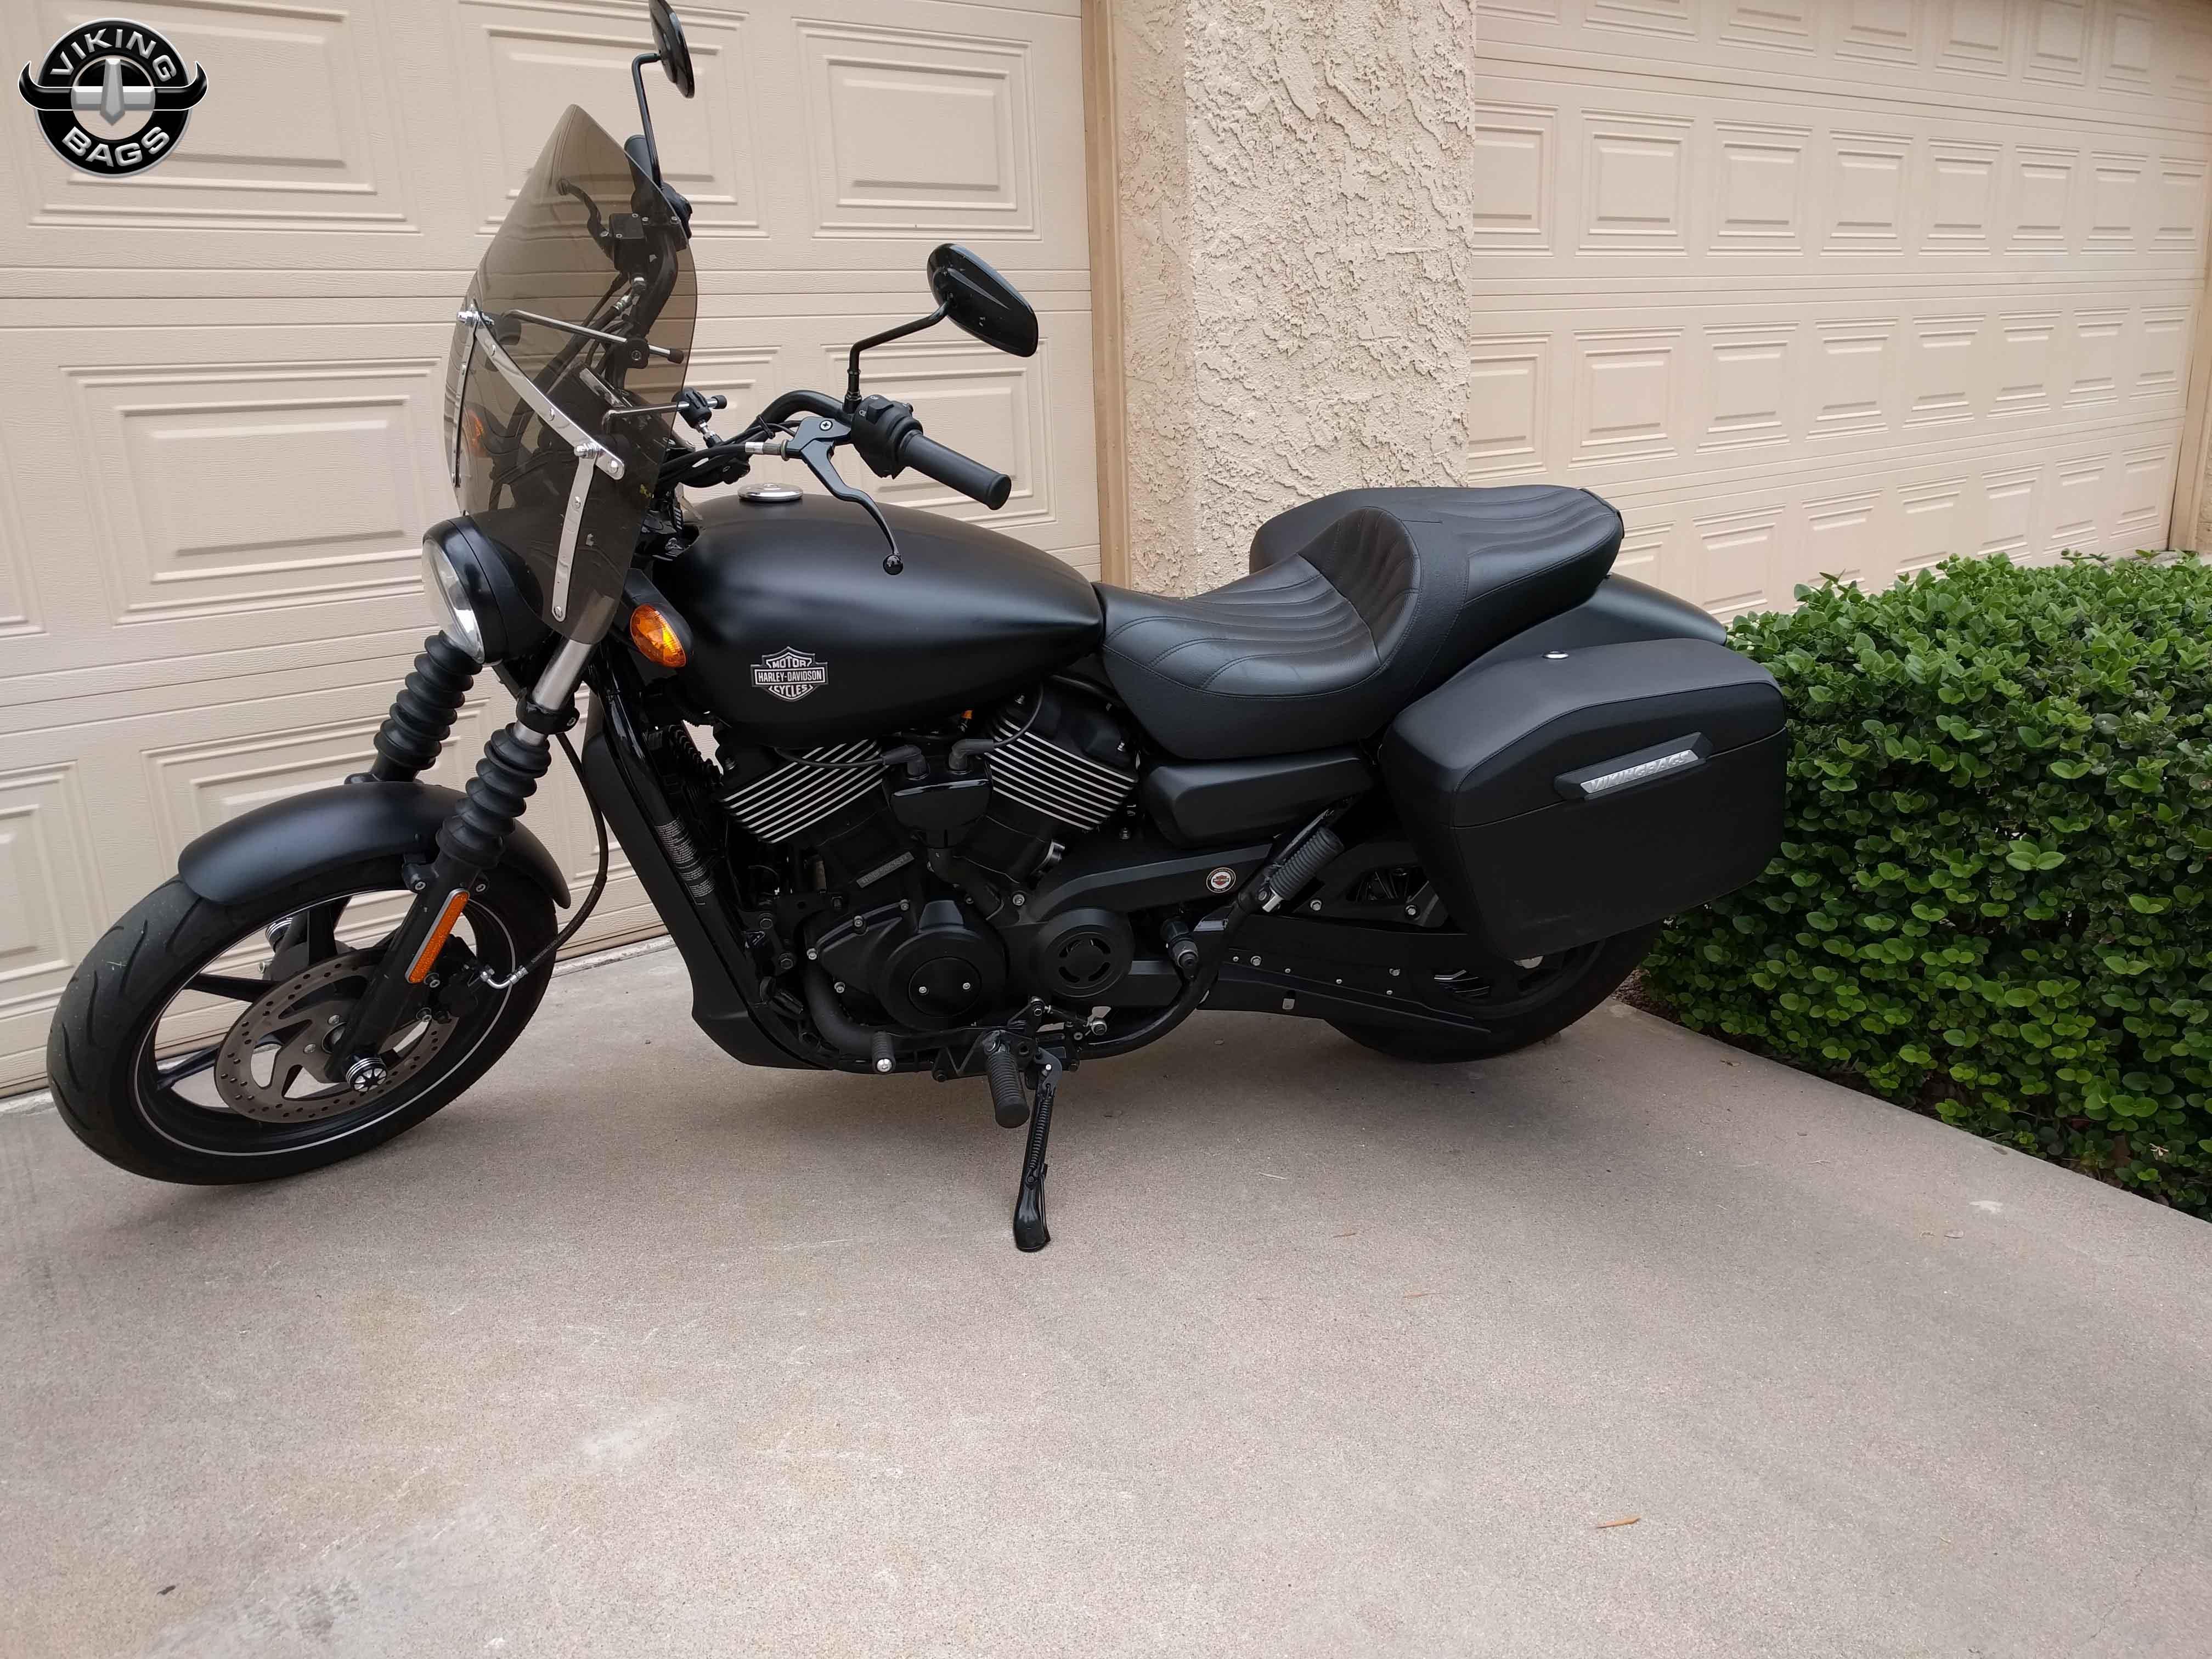 Harley Davidson Street Motorcycle Luggage Customer Photo Gallery 2015 Tour Pack Seanroe 2015hdstreet750 Saddlebags